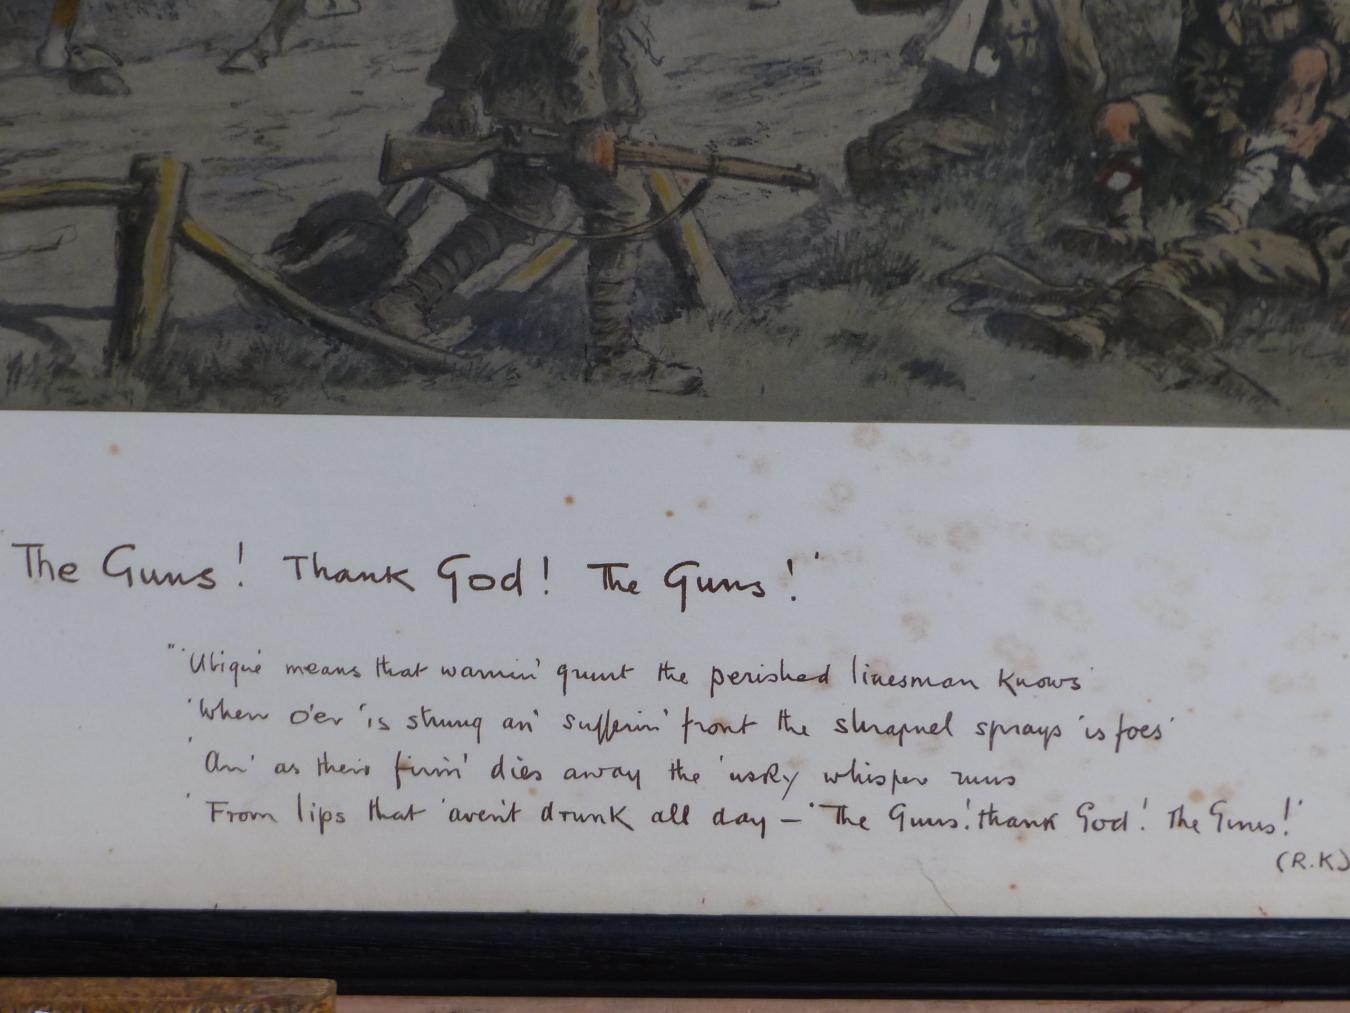 SNAFFLES, CHARLES JOHNSON PAYNE (1884-1967) THE GUNS, THANK GOD, THE GUNS!. COLOUR PRINT. 47 x - Image 4 of 4